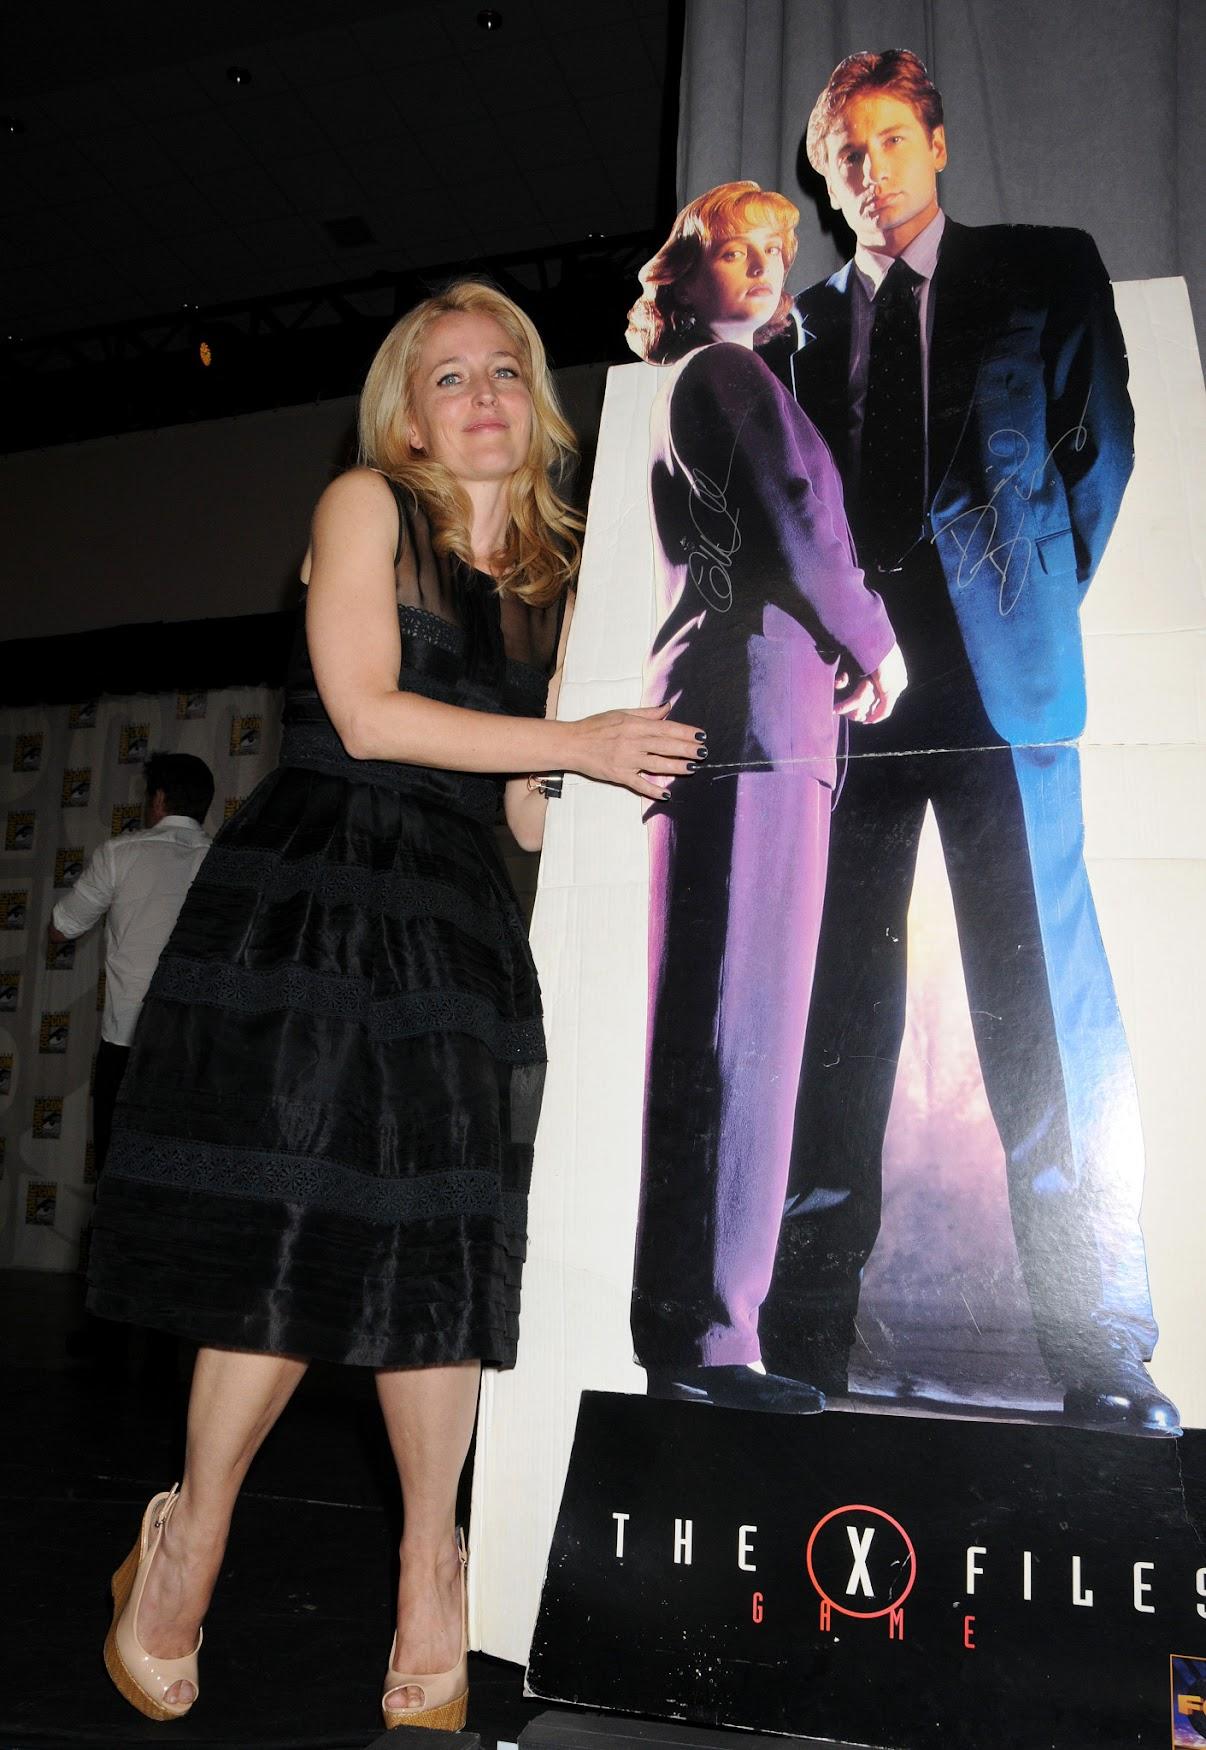 http://2.bp.blogspot.com/-8T8QscA4BaY/Ue3OMtGHZ4I/AAAAAAAAGmY/krv06xOKYPU/s1750/EGA_Gillian-Anderson_The-X-Files-20th-Anniversary-Panel_San-Diego-Comic-Con-13_Jul-18-2013_36.JPG